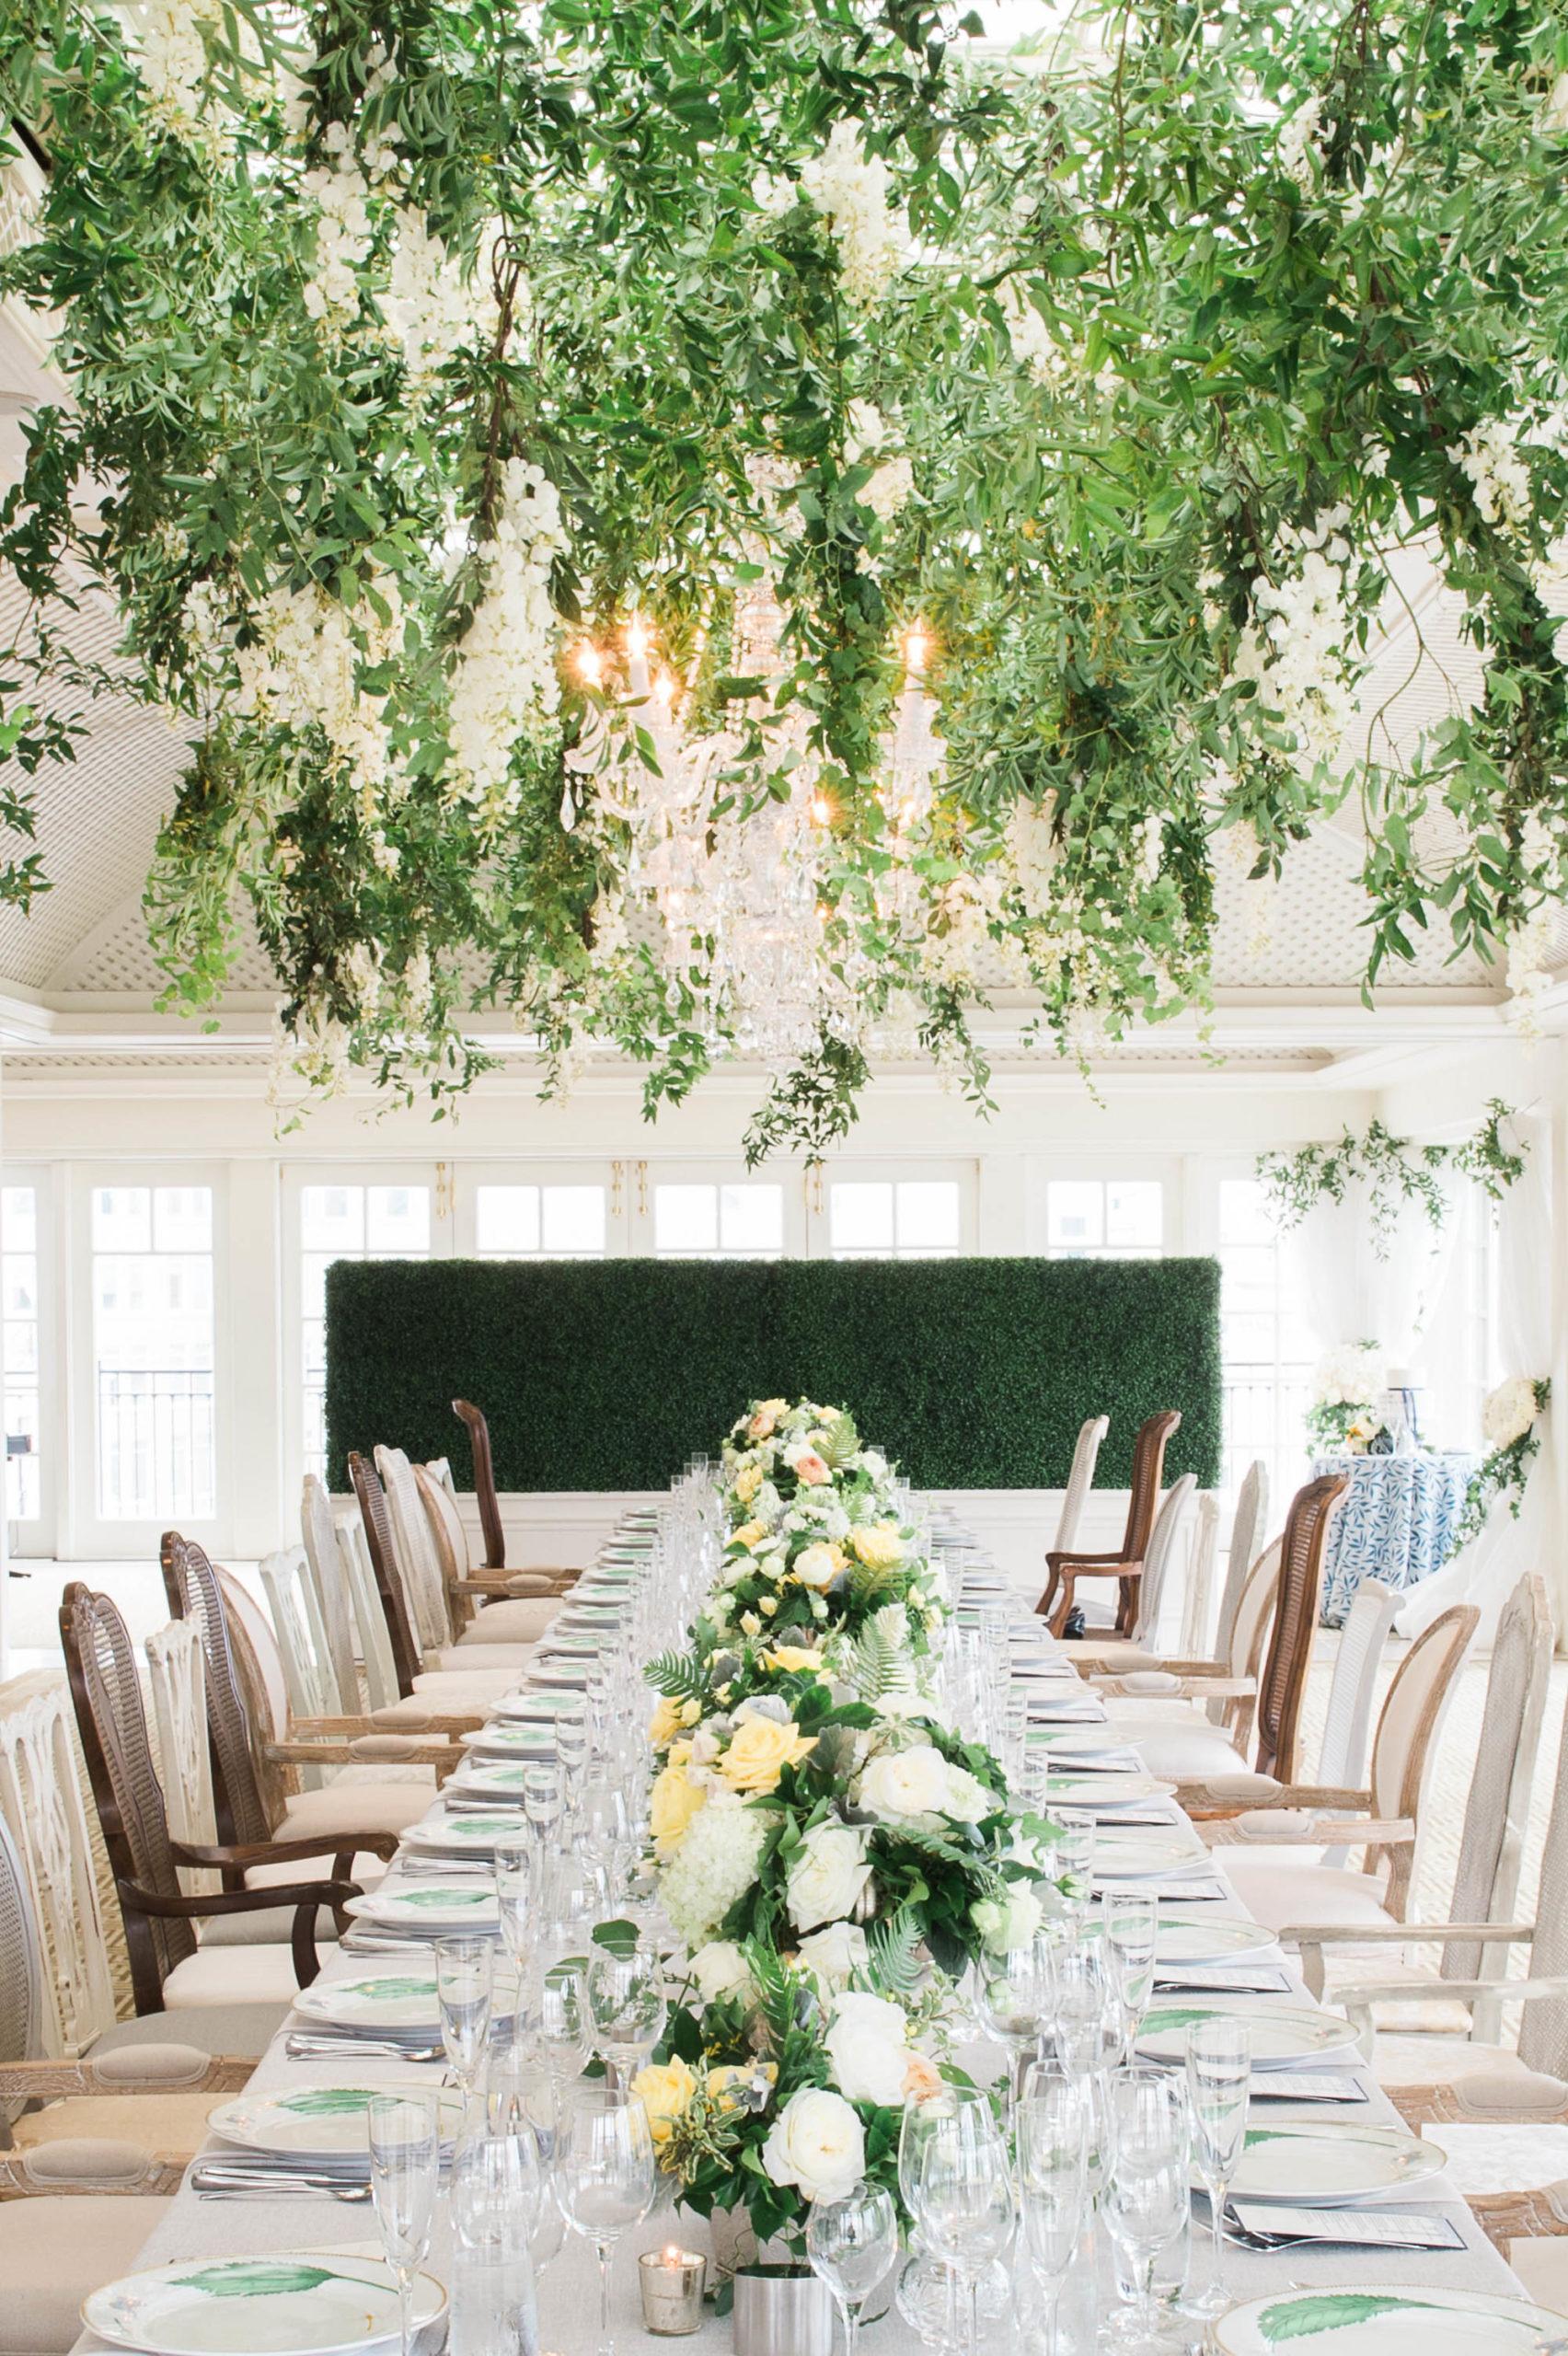 Hay Adams wedding table with garden party themed